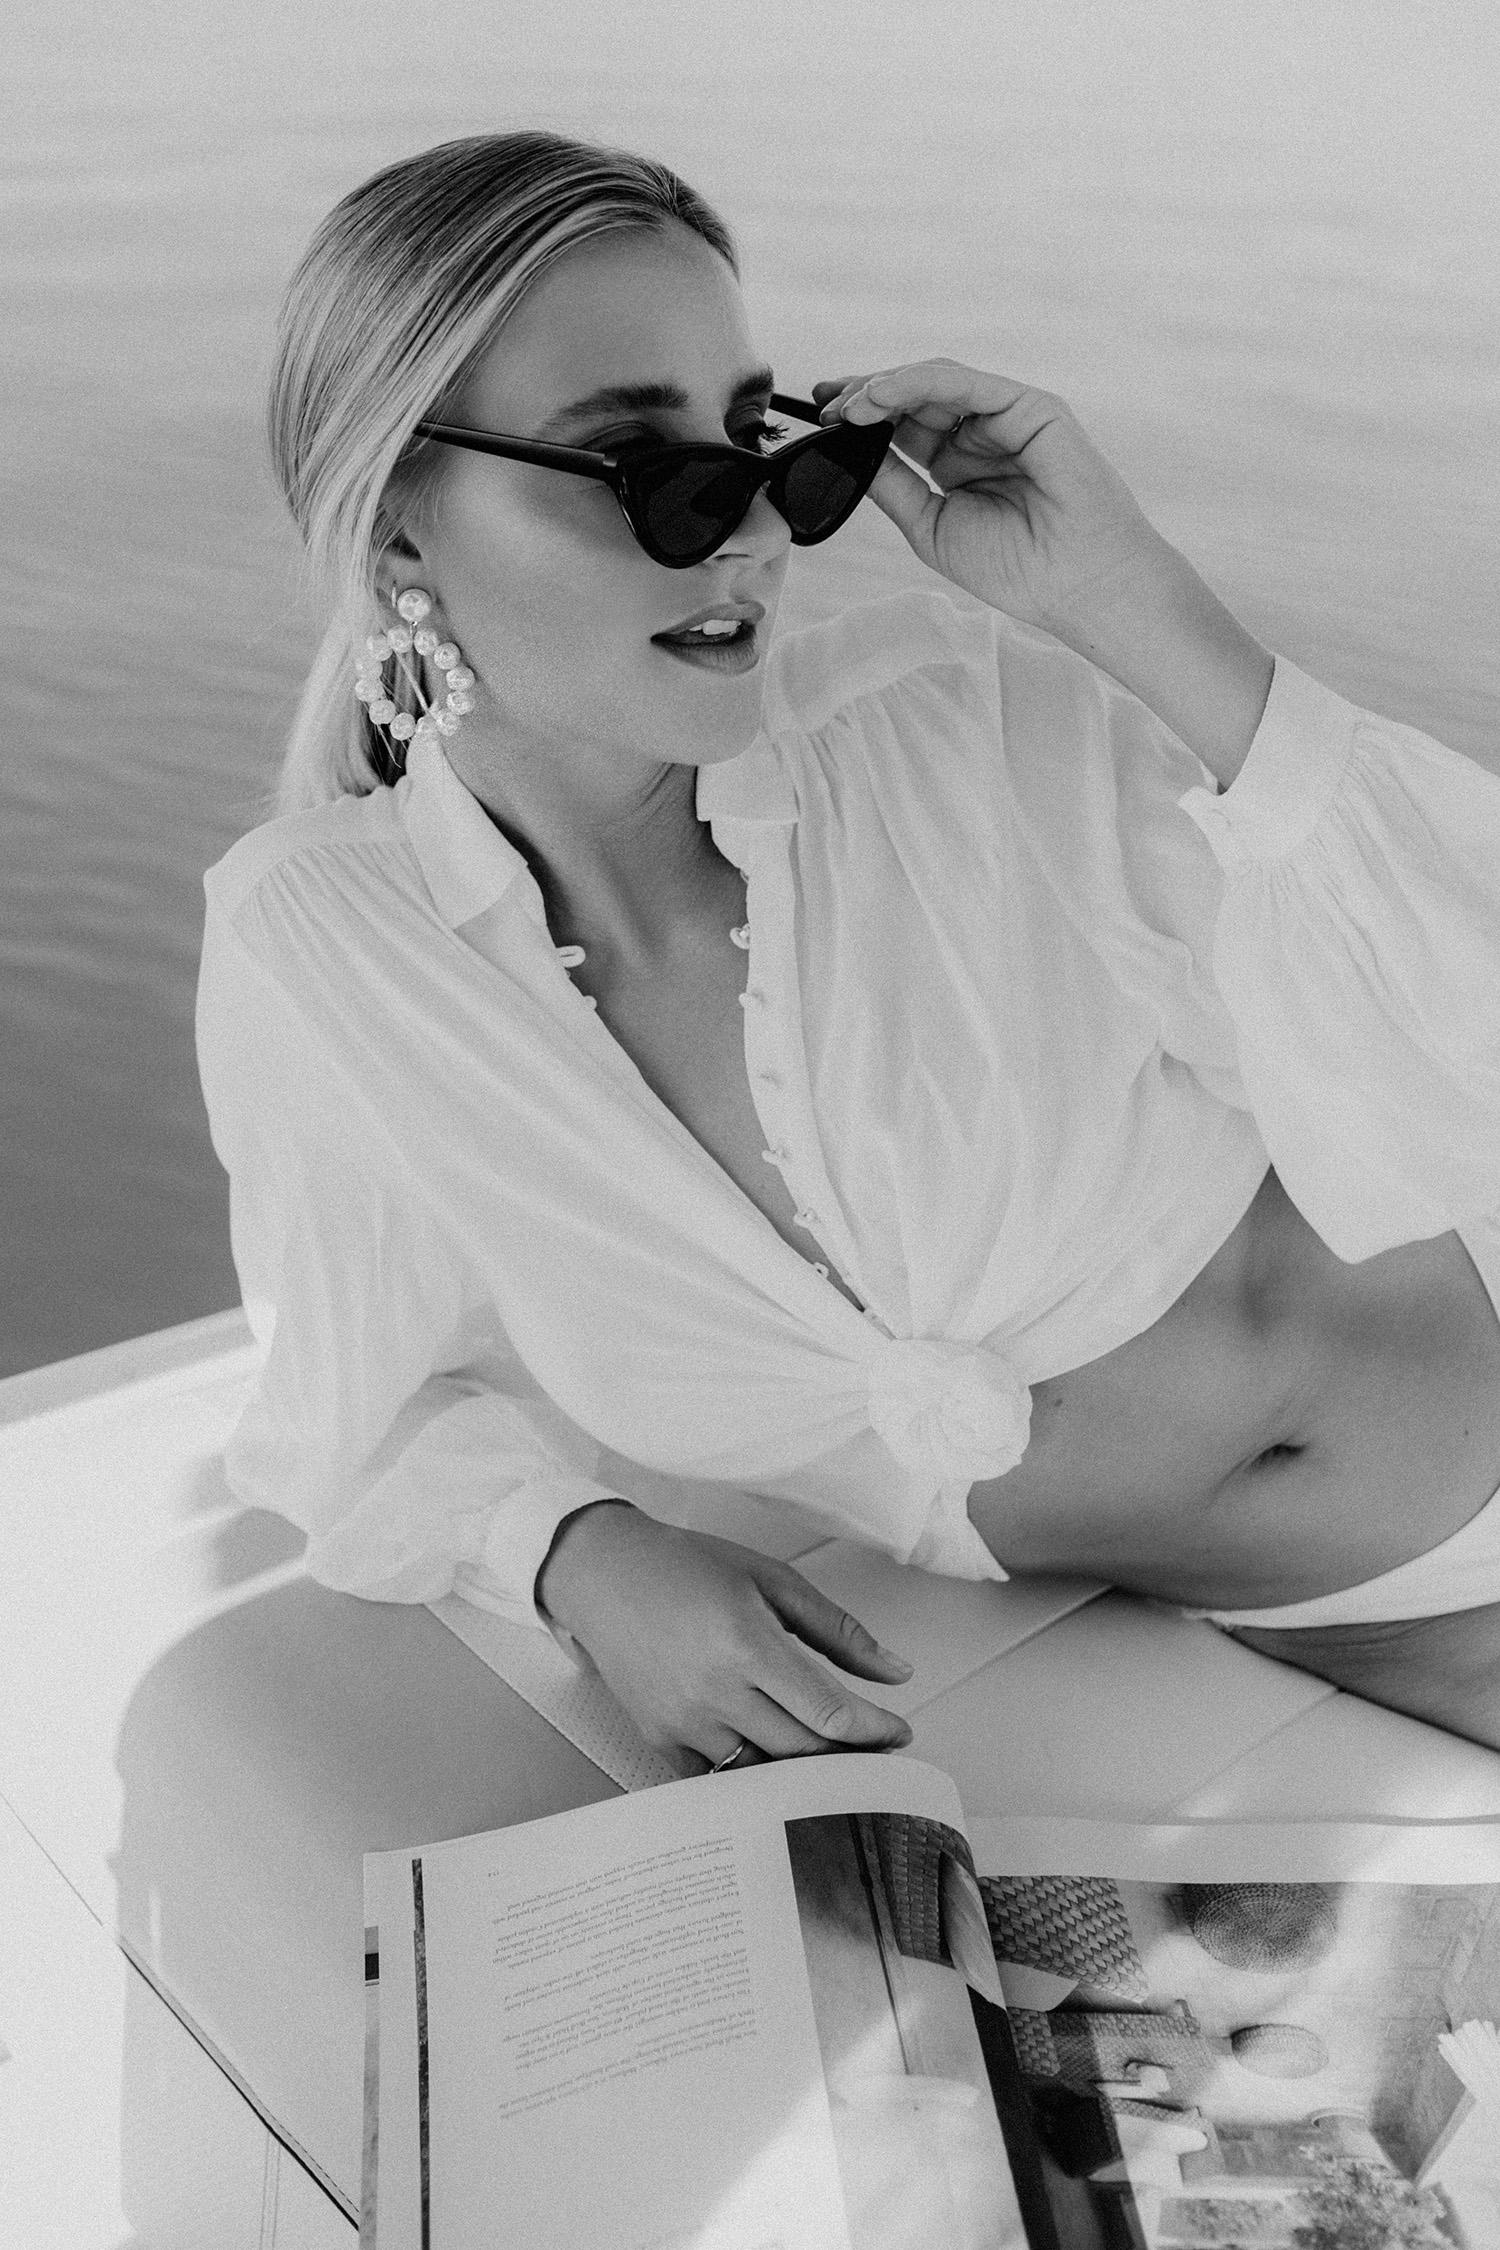 Muenchen-Fashion-Beauty-Fotografie-Anna-Fichtner-Fotograf-M4